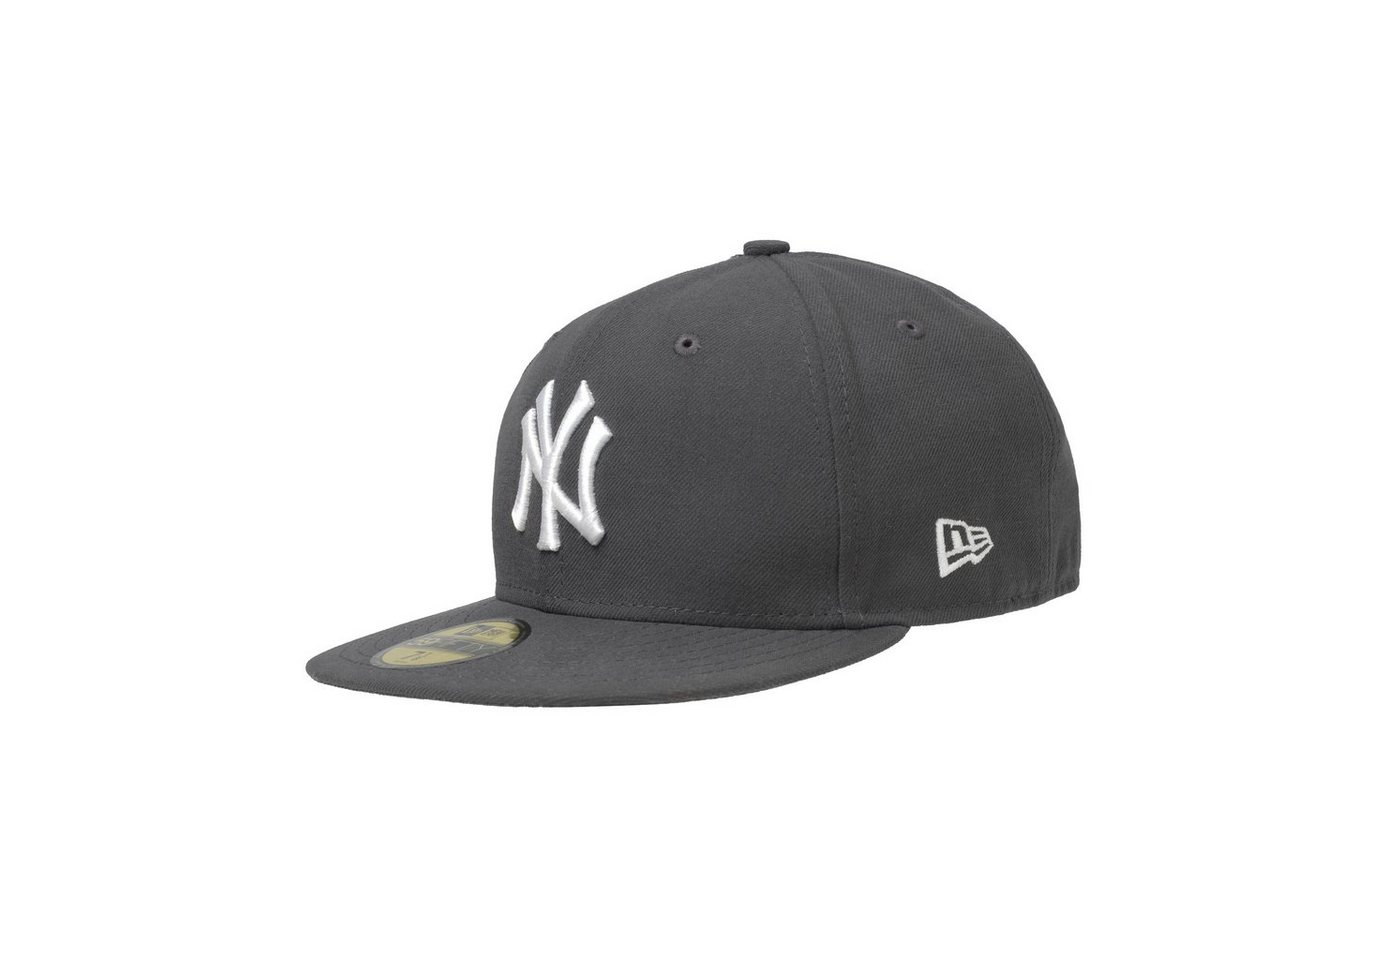 New Era Snapback Cap »59Fifty New York Yankees«   Accessoires > Caps > Snapback Caps   Schwarz   New Era